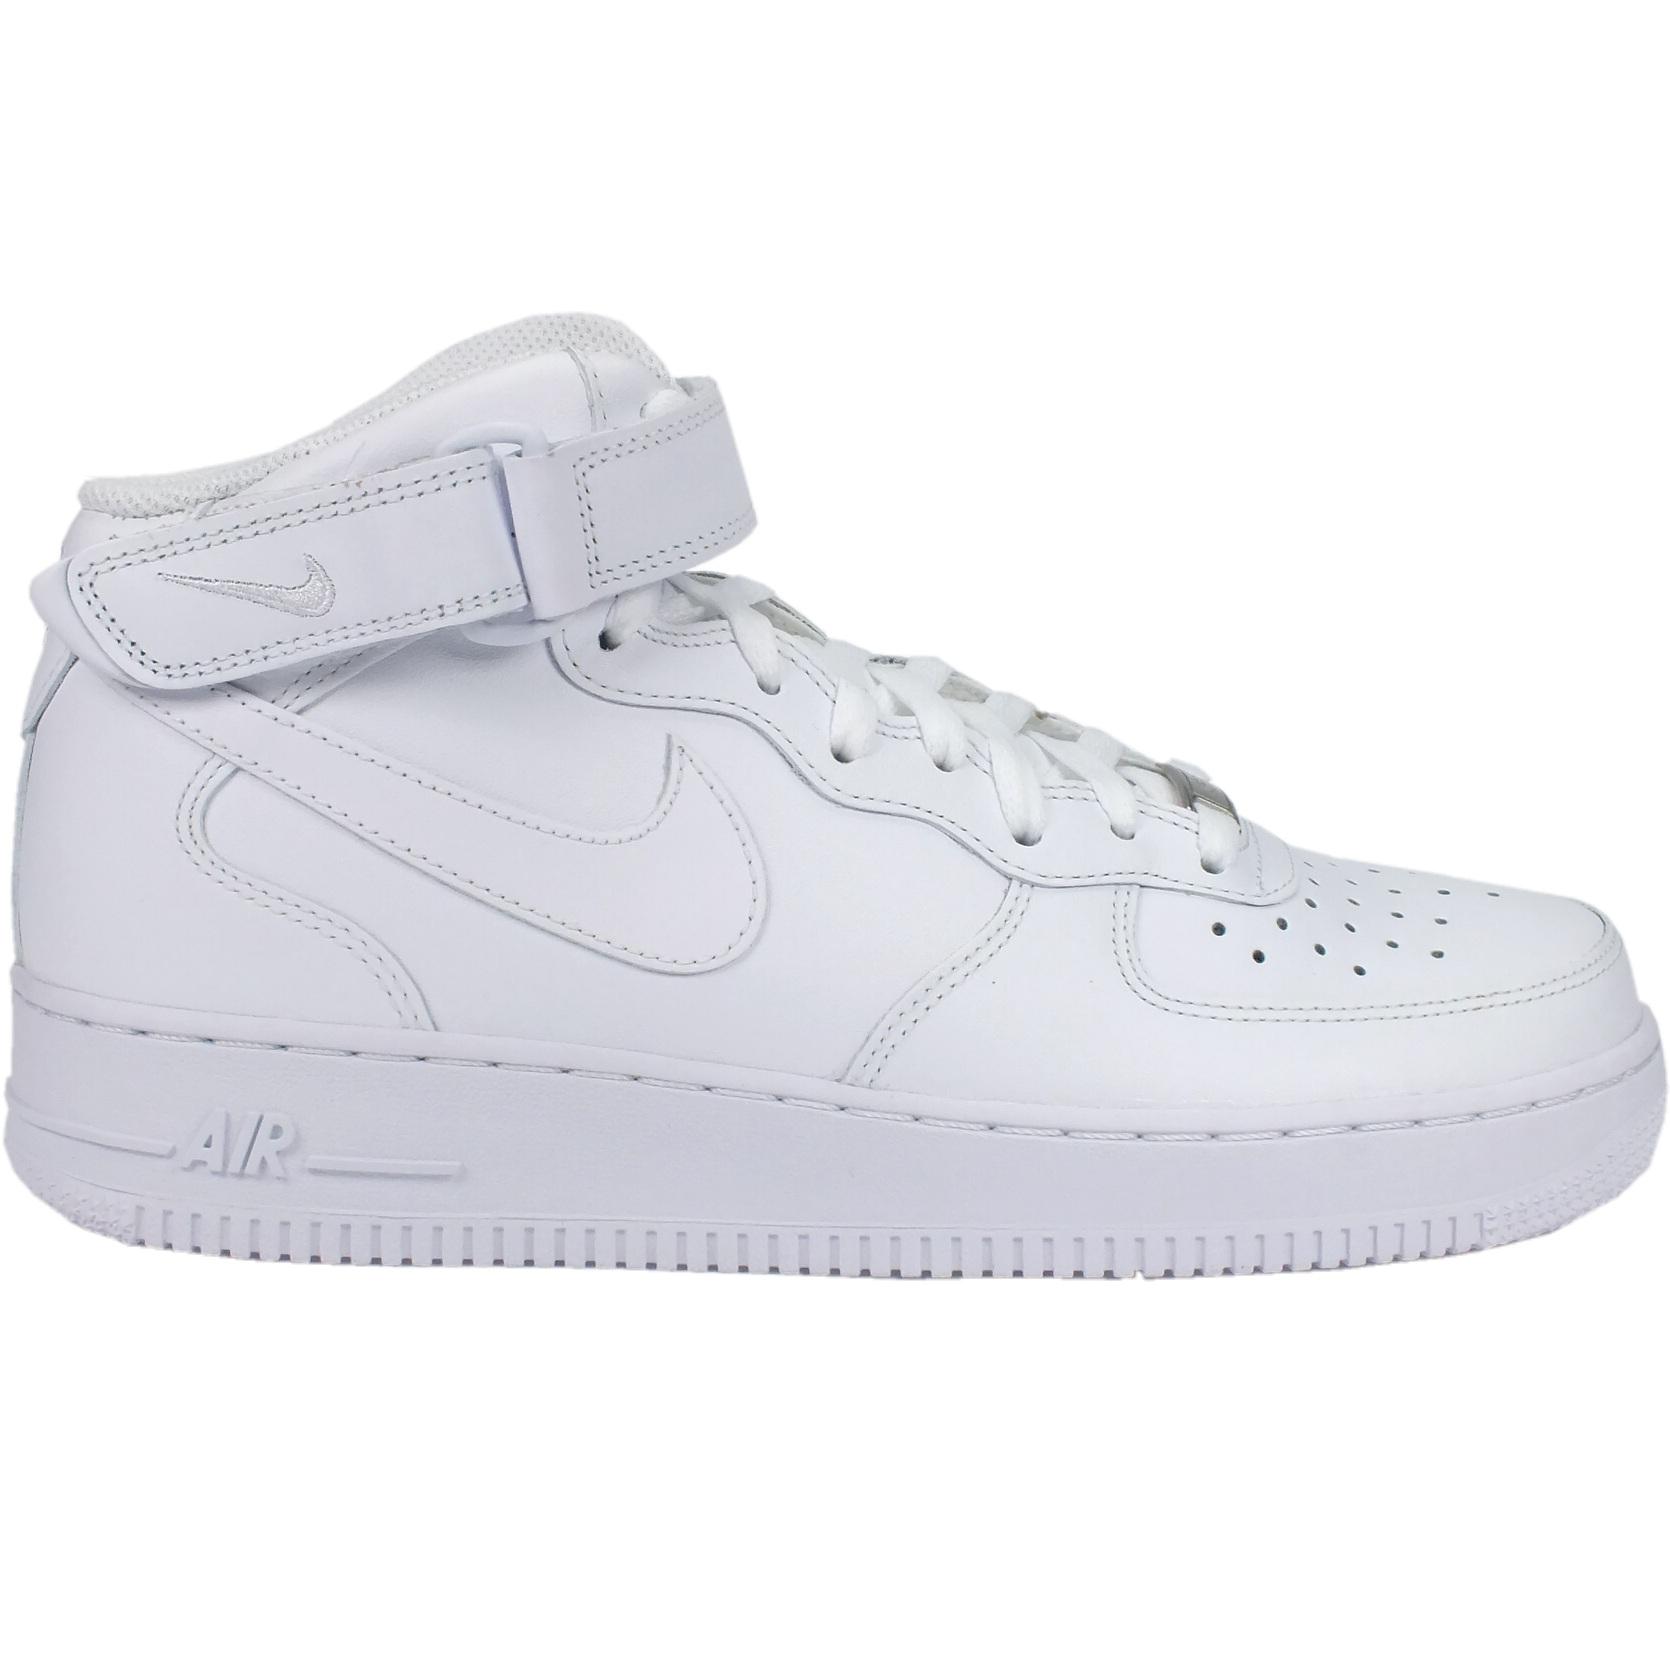 nike air force 1 mid 07 schuhe sneaker high top herren. Black Bedroom Furniture Sets. Home Design Ideas